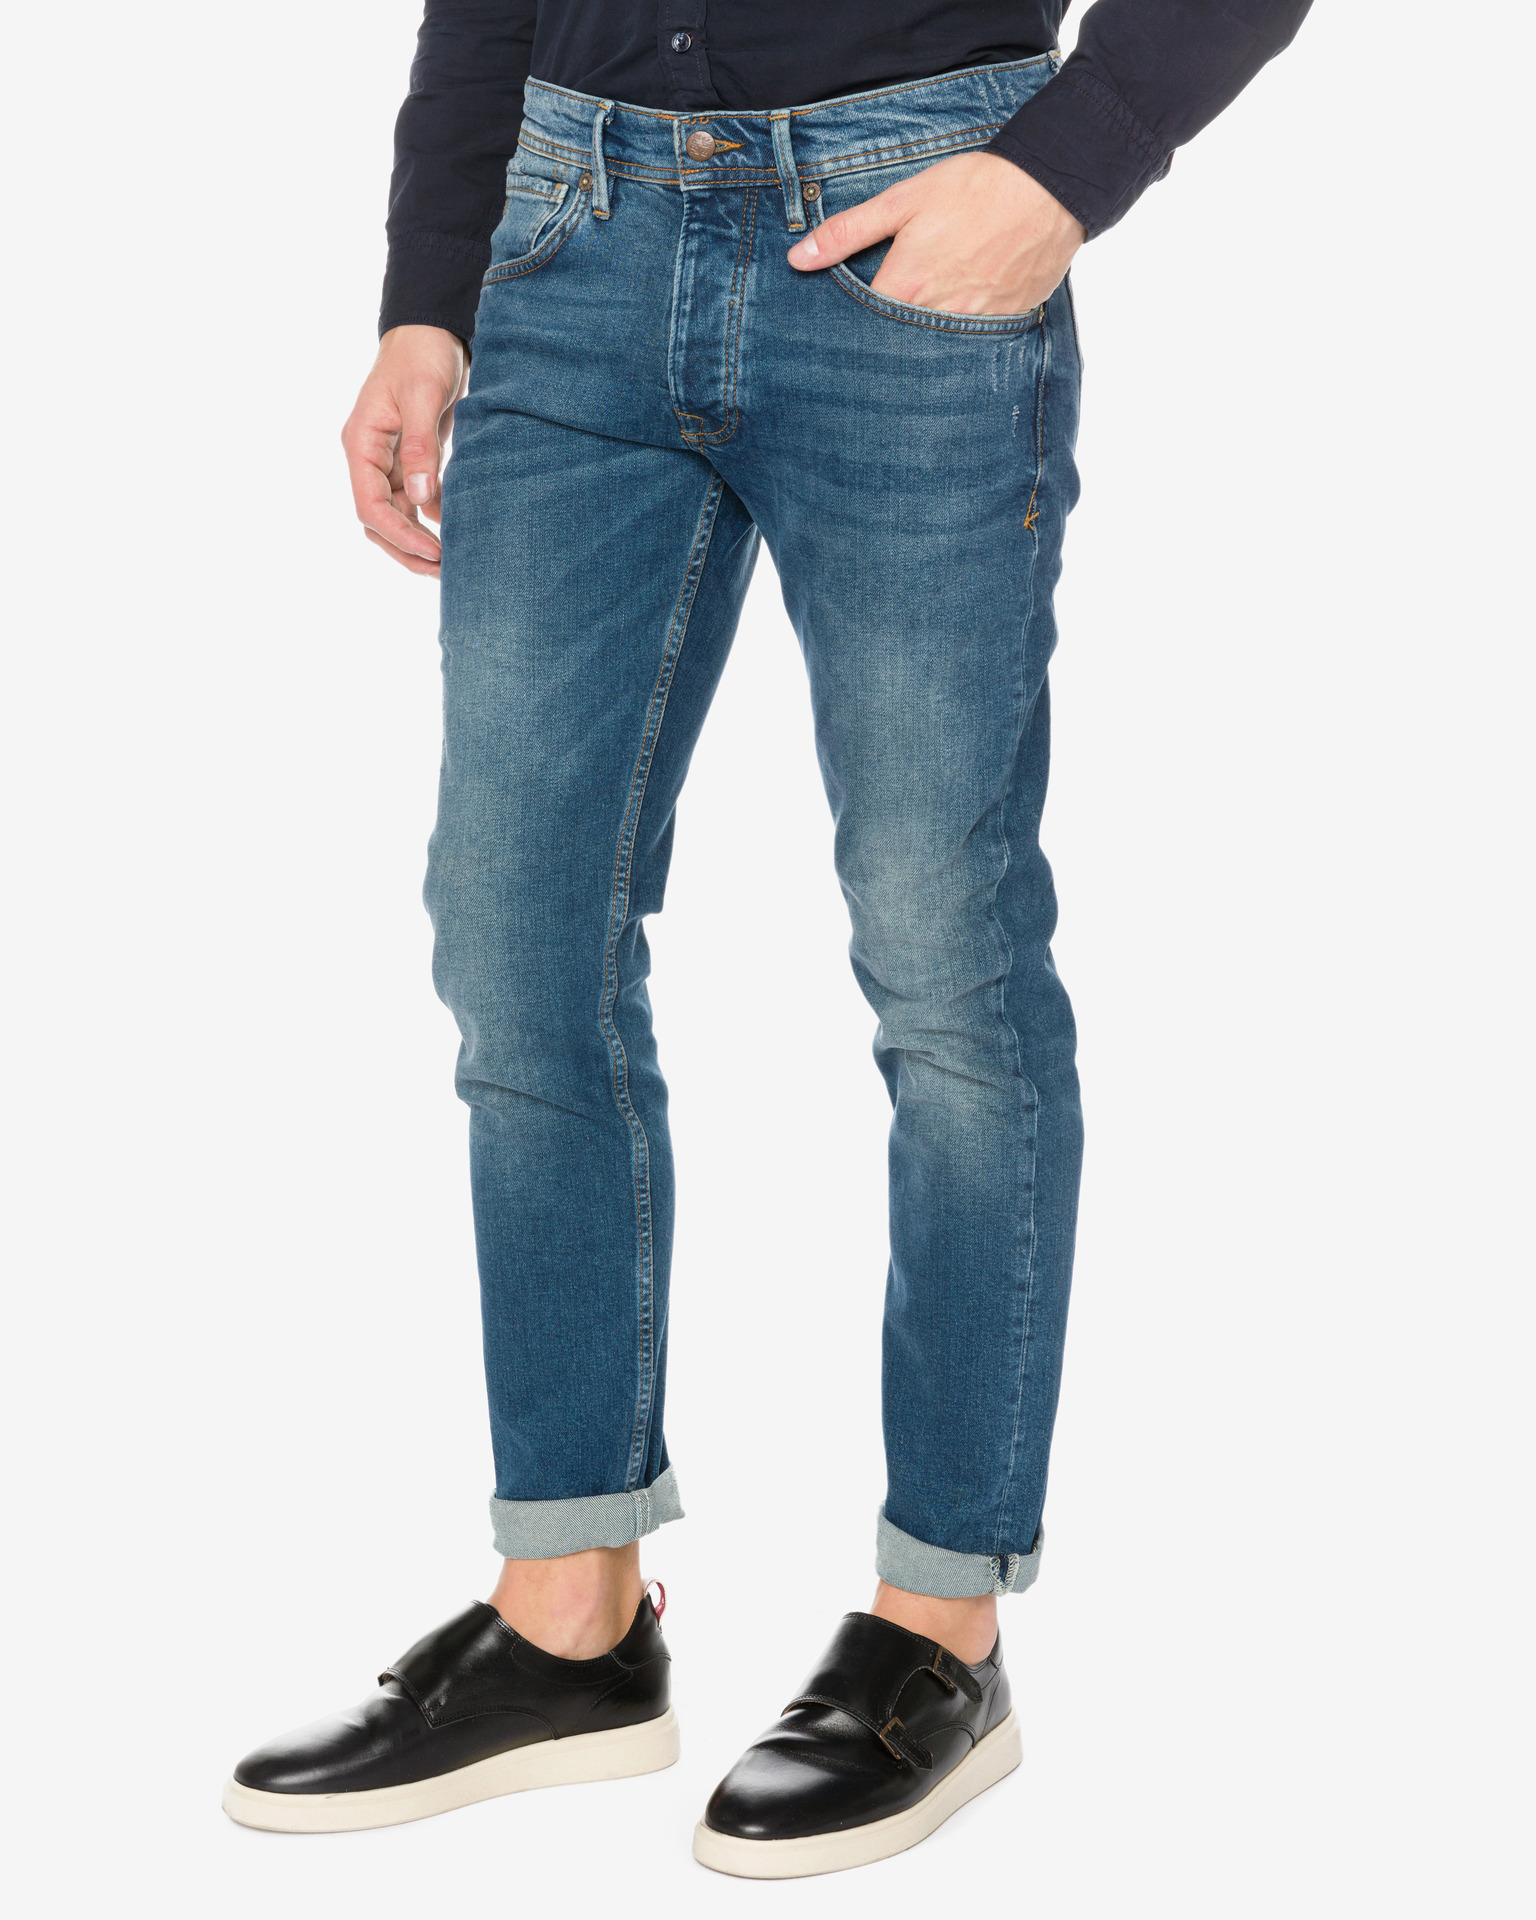 Pepe Jeans - Cash HRTG Jeans Bibloo.com 45ea4e7718